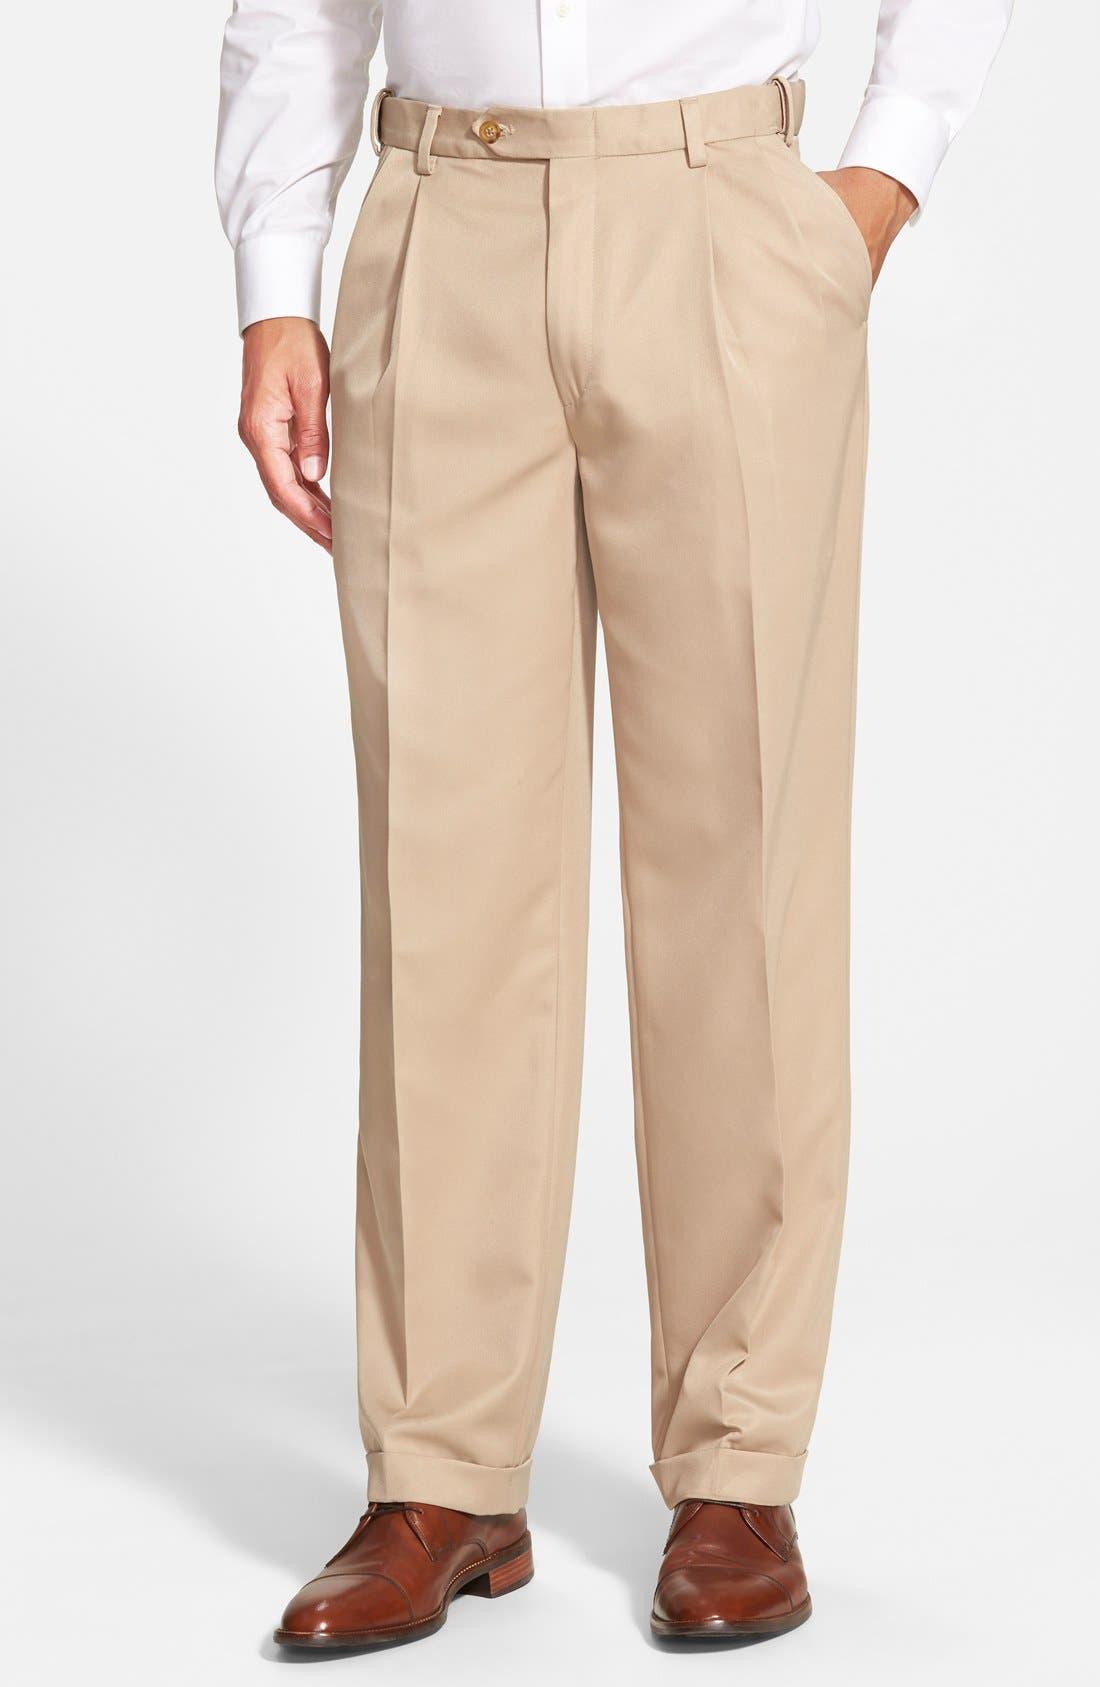 Main Image - Berle Self Sizer Waist Pleated Trousers